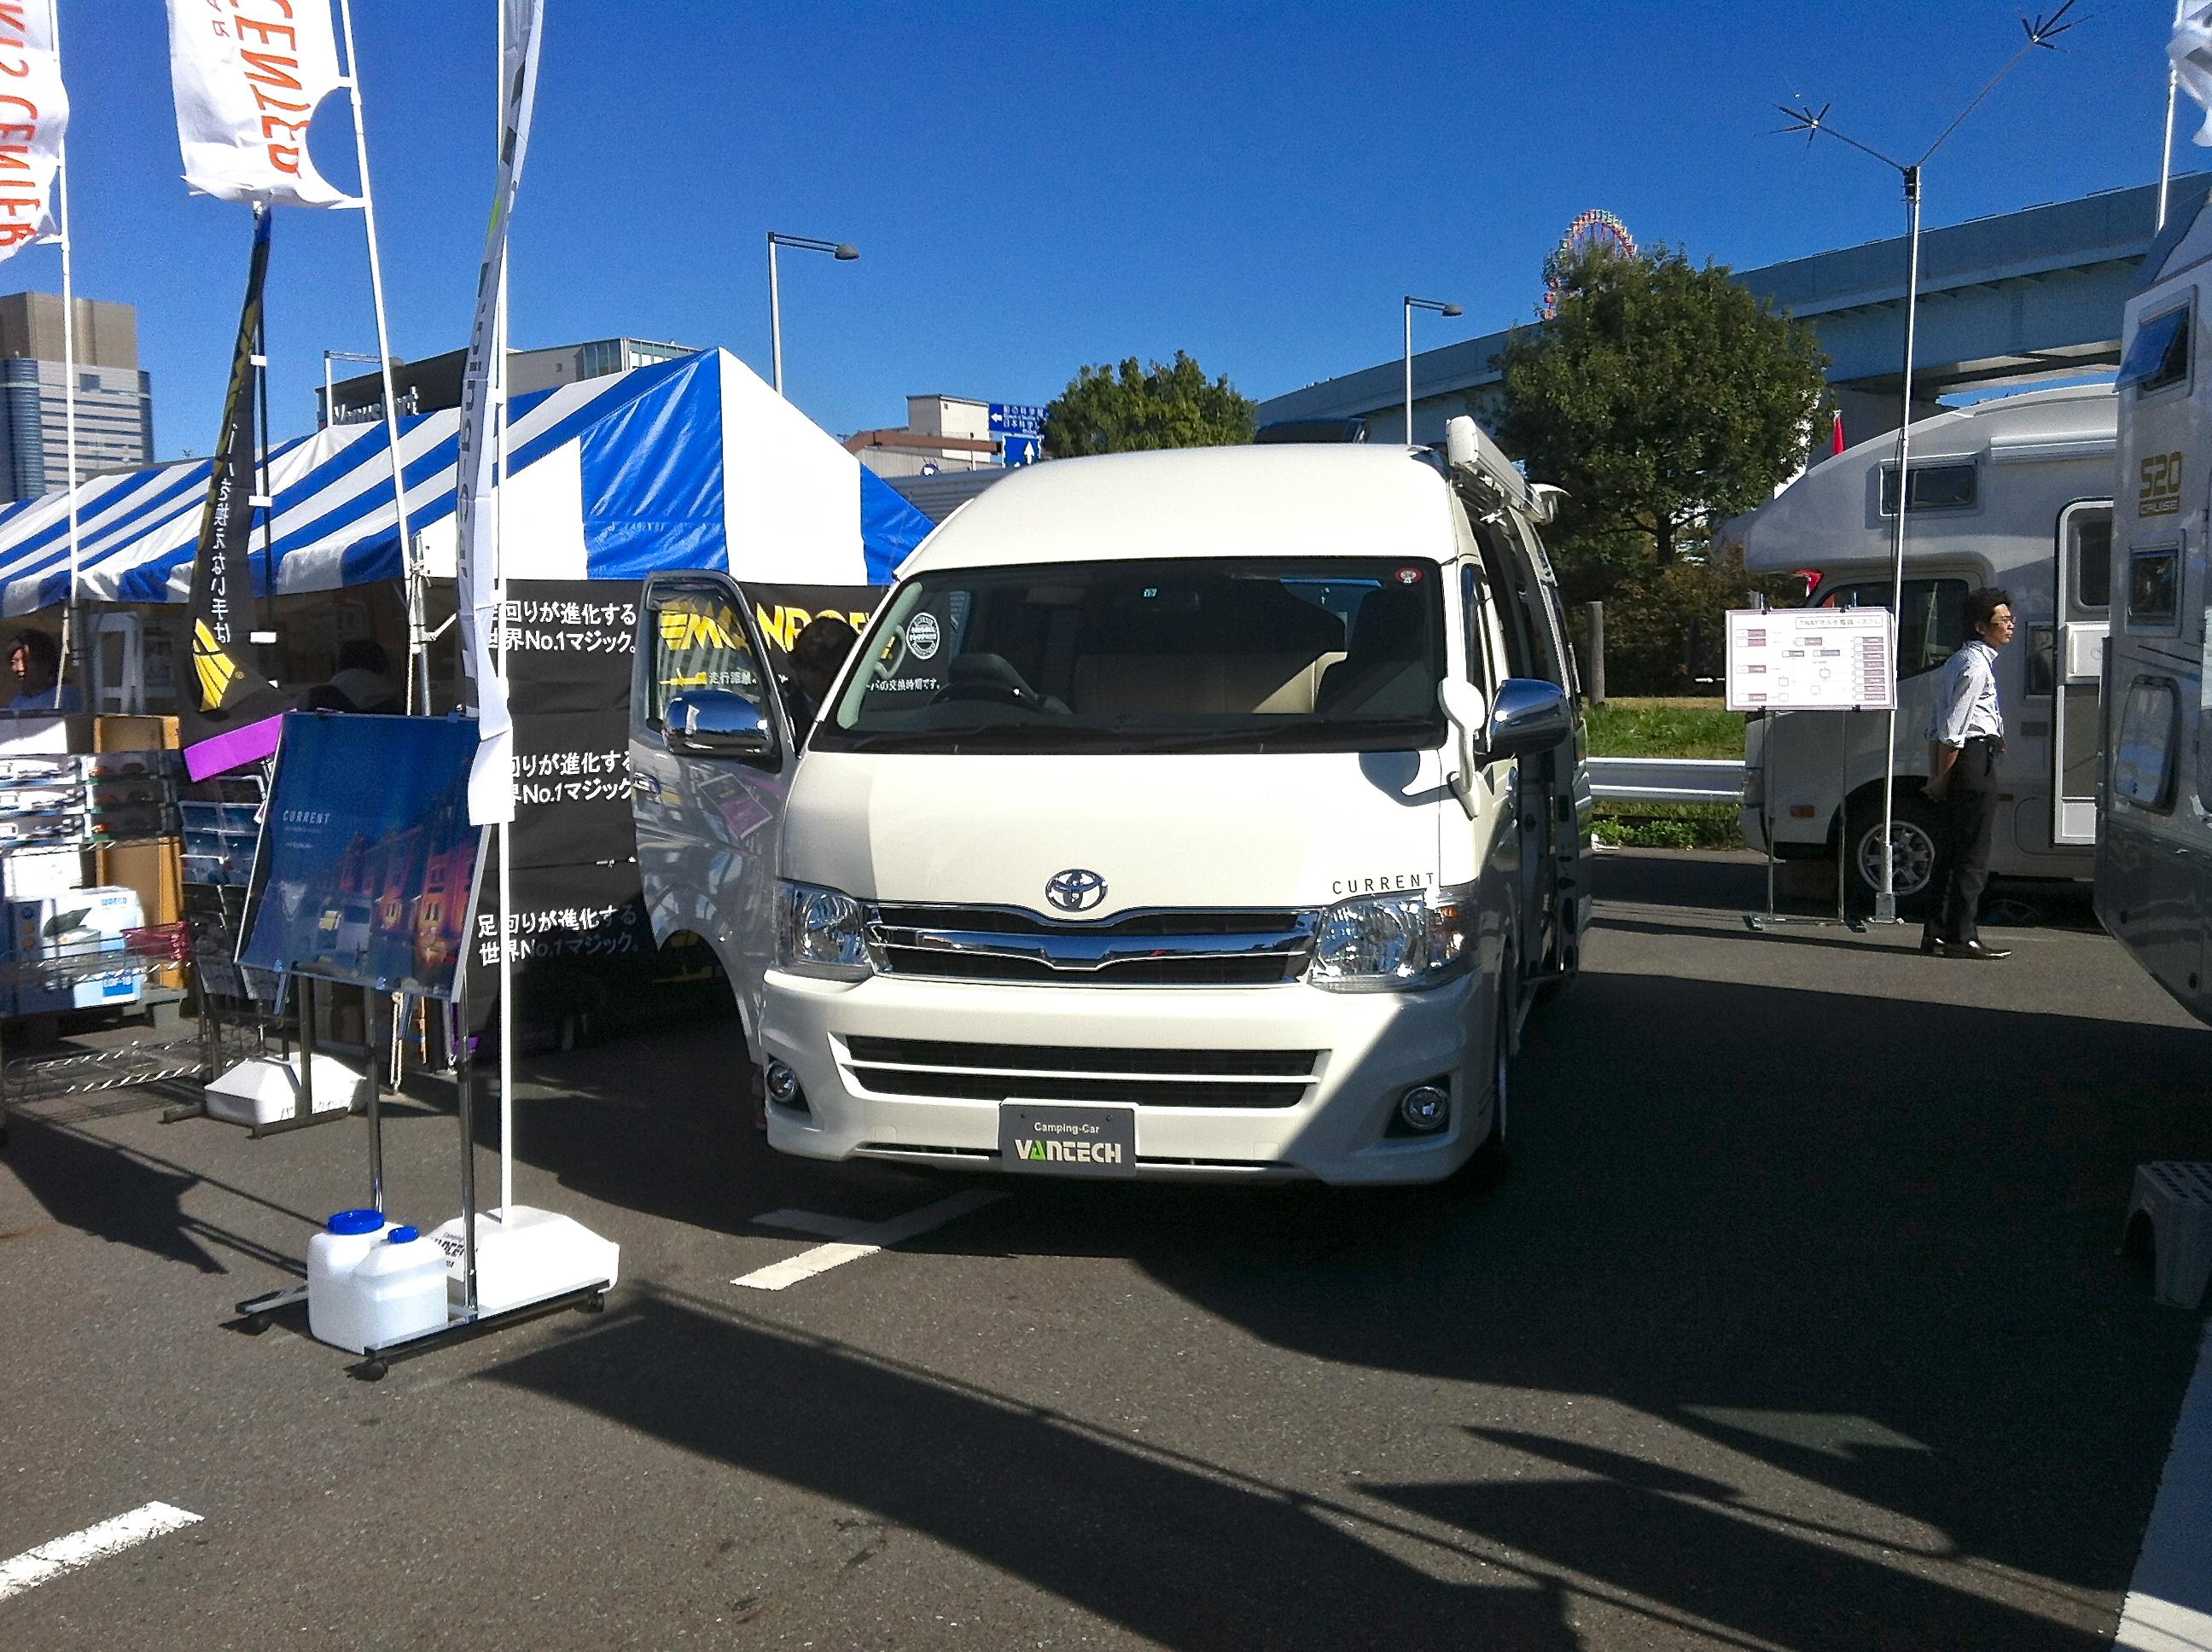 http://www.vantech.jp/shops/info/IMG_0522.JPG